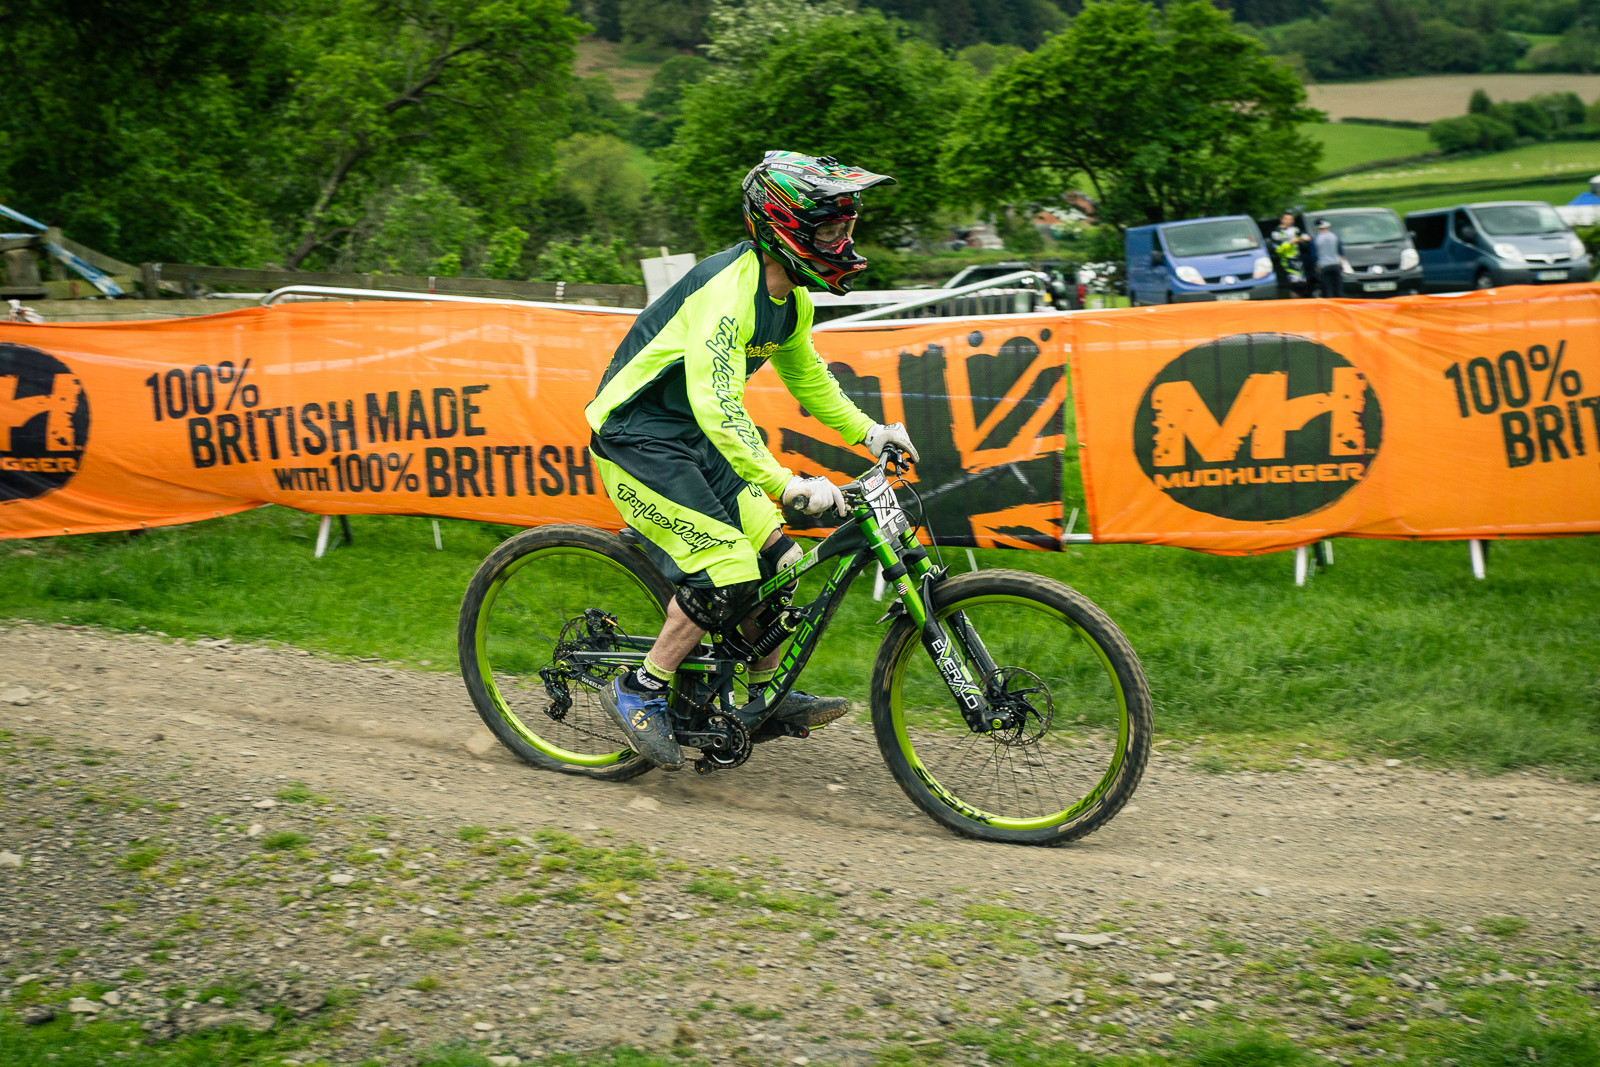 Intense 951 EVO G-ed Out at Llangollen - G-Out Project - Llangollen BDS 2015 - Mountain Biking Pictures - Vital MTB